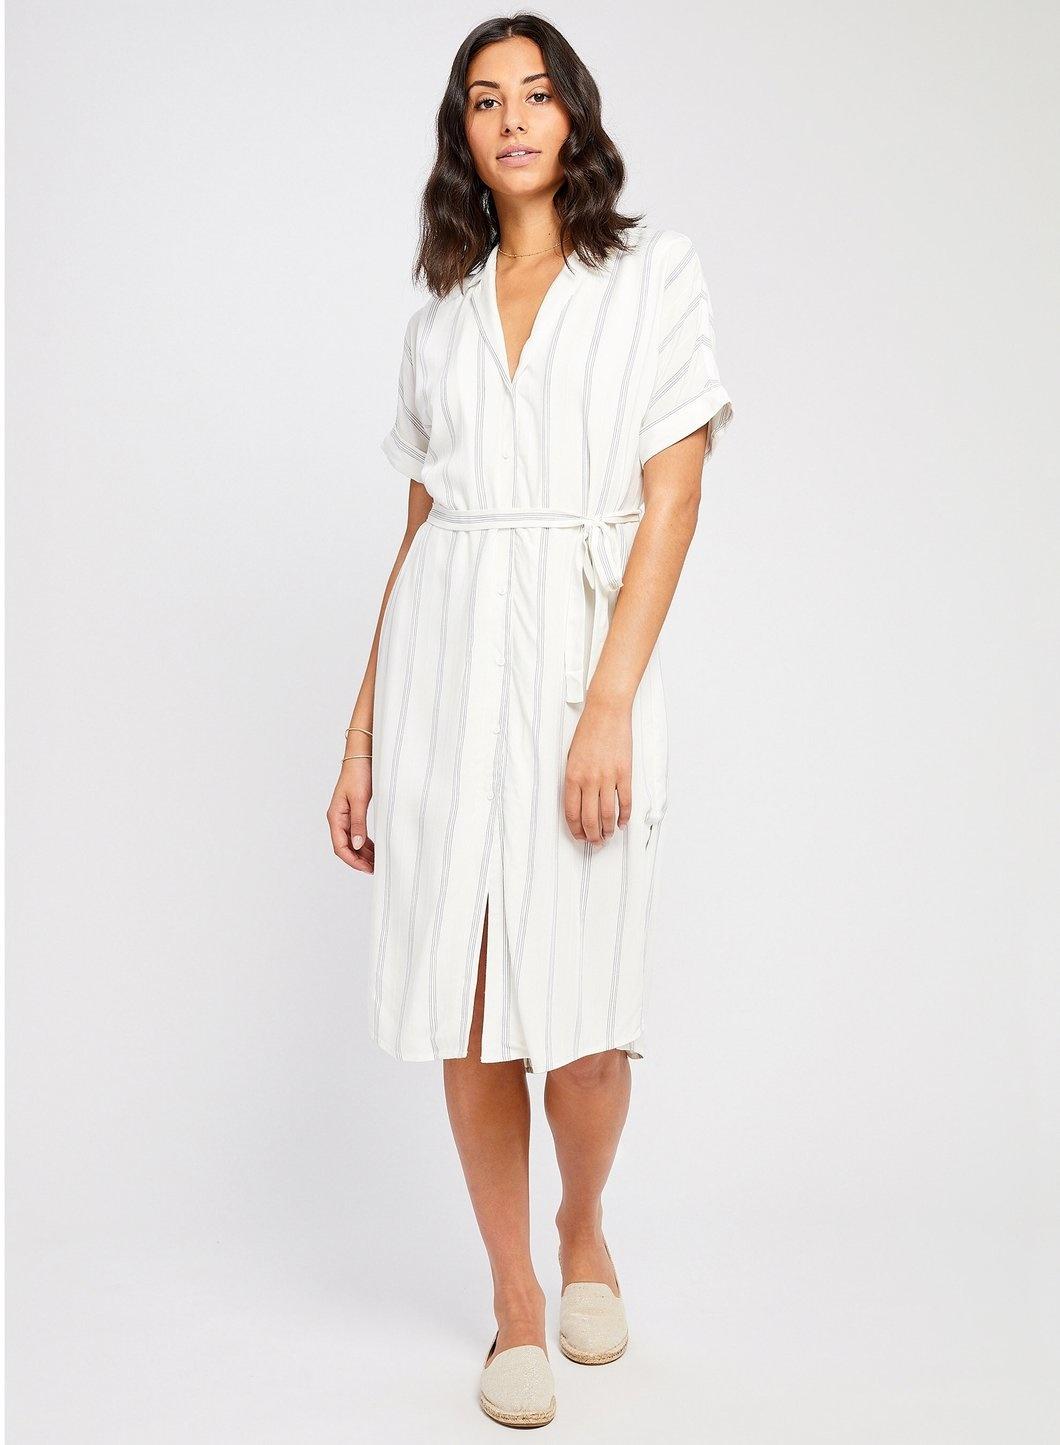 Gentlefawn Kaysey Dress